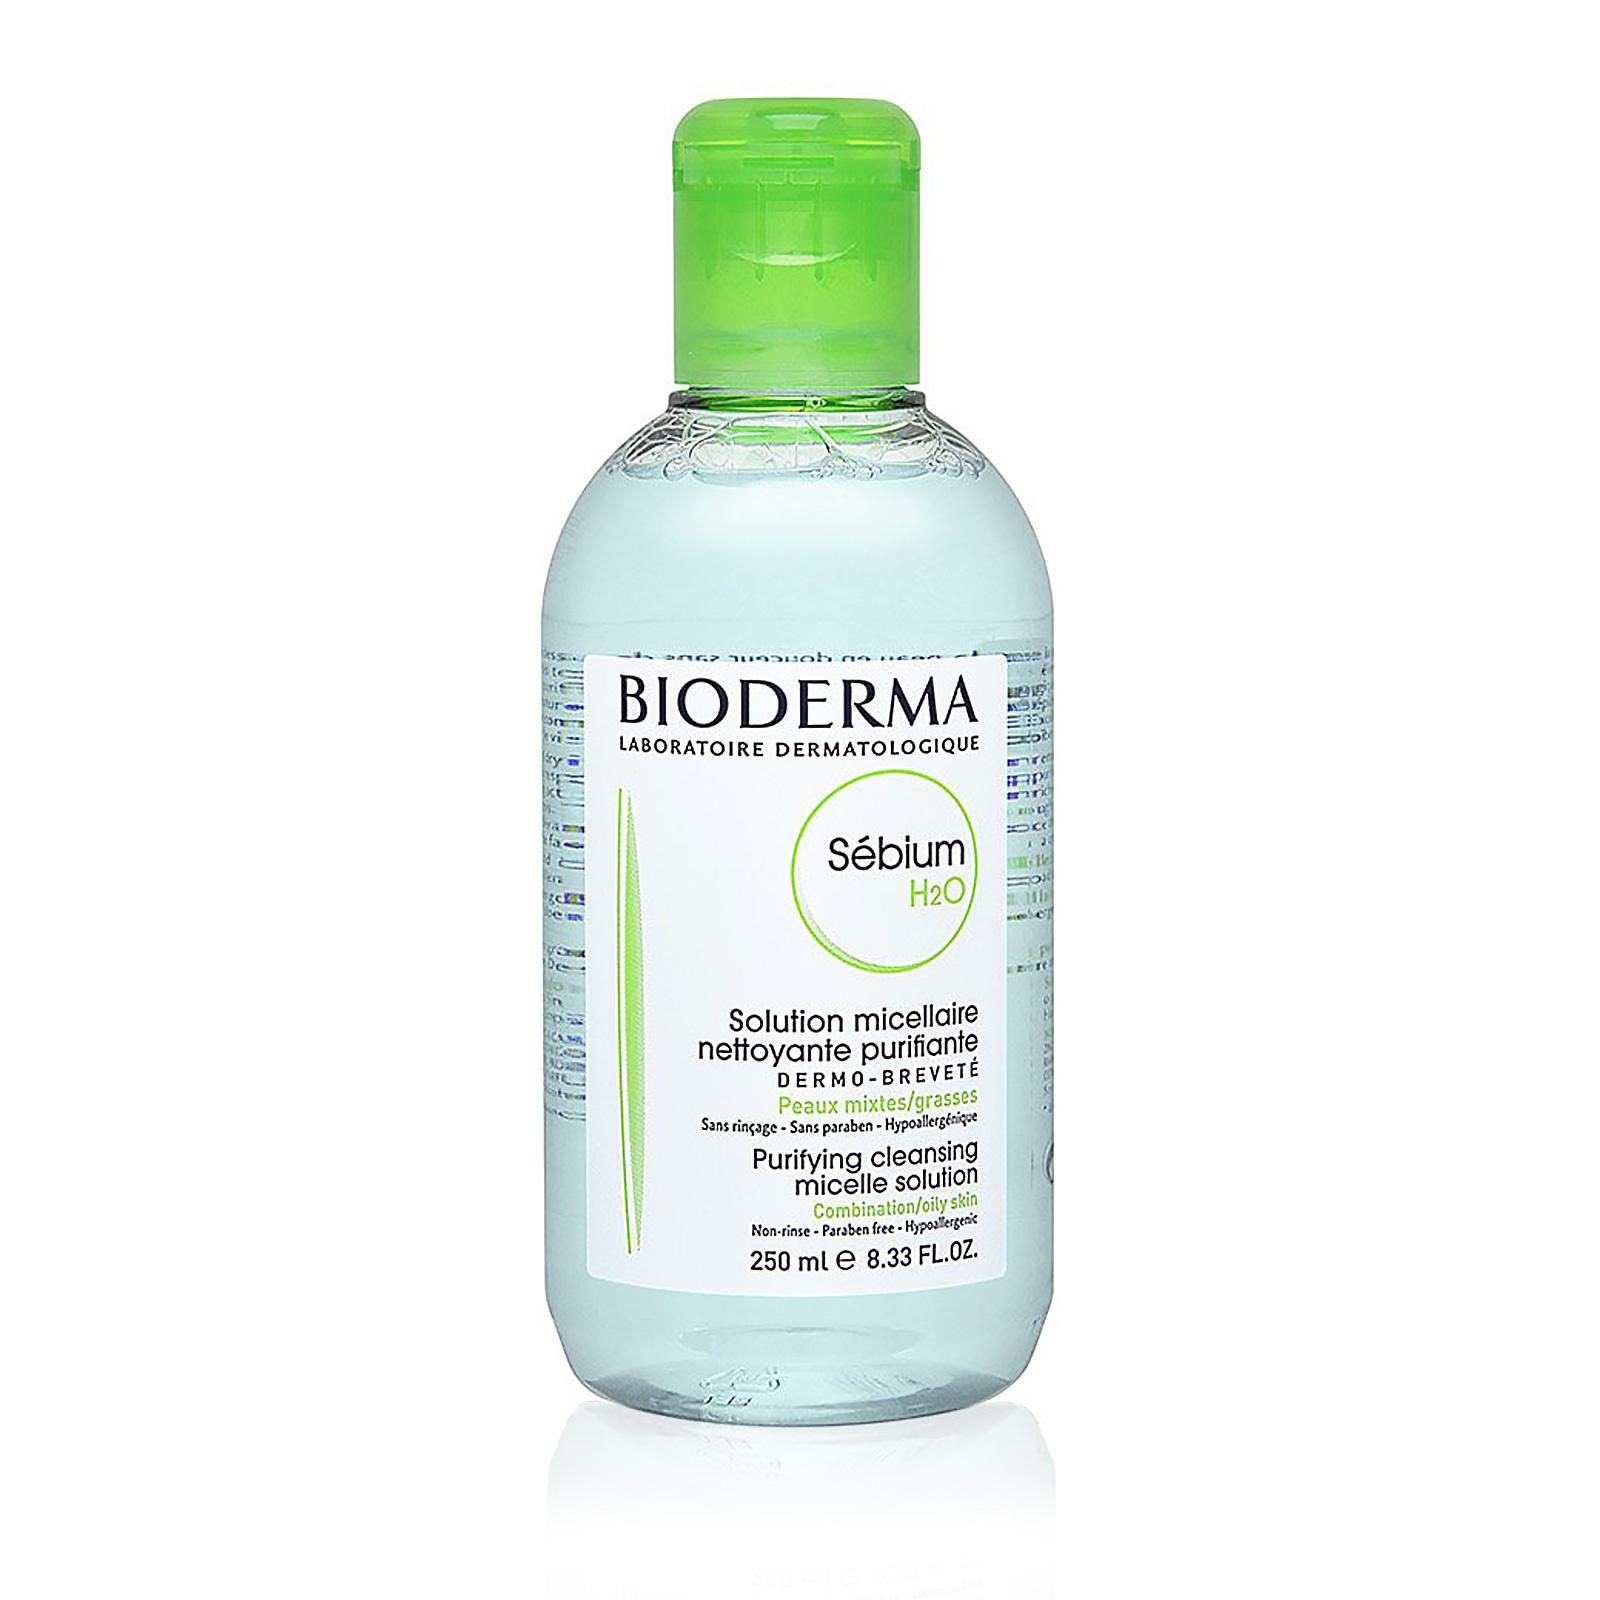 Sébium H2O Micelle Solution (Combination or Oily Skin)